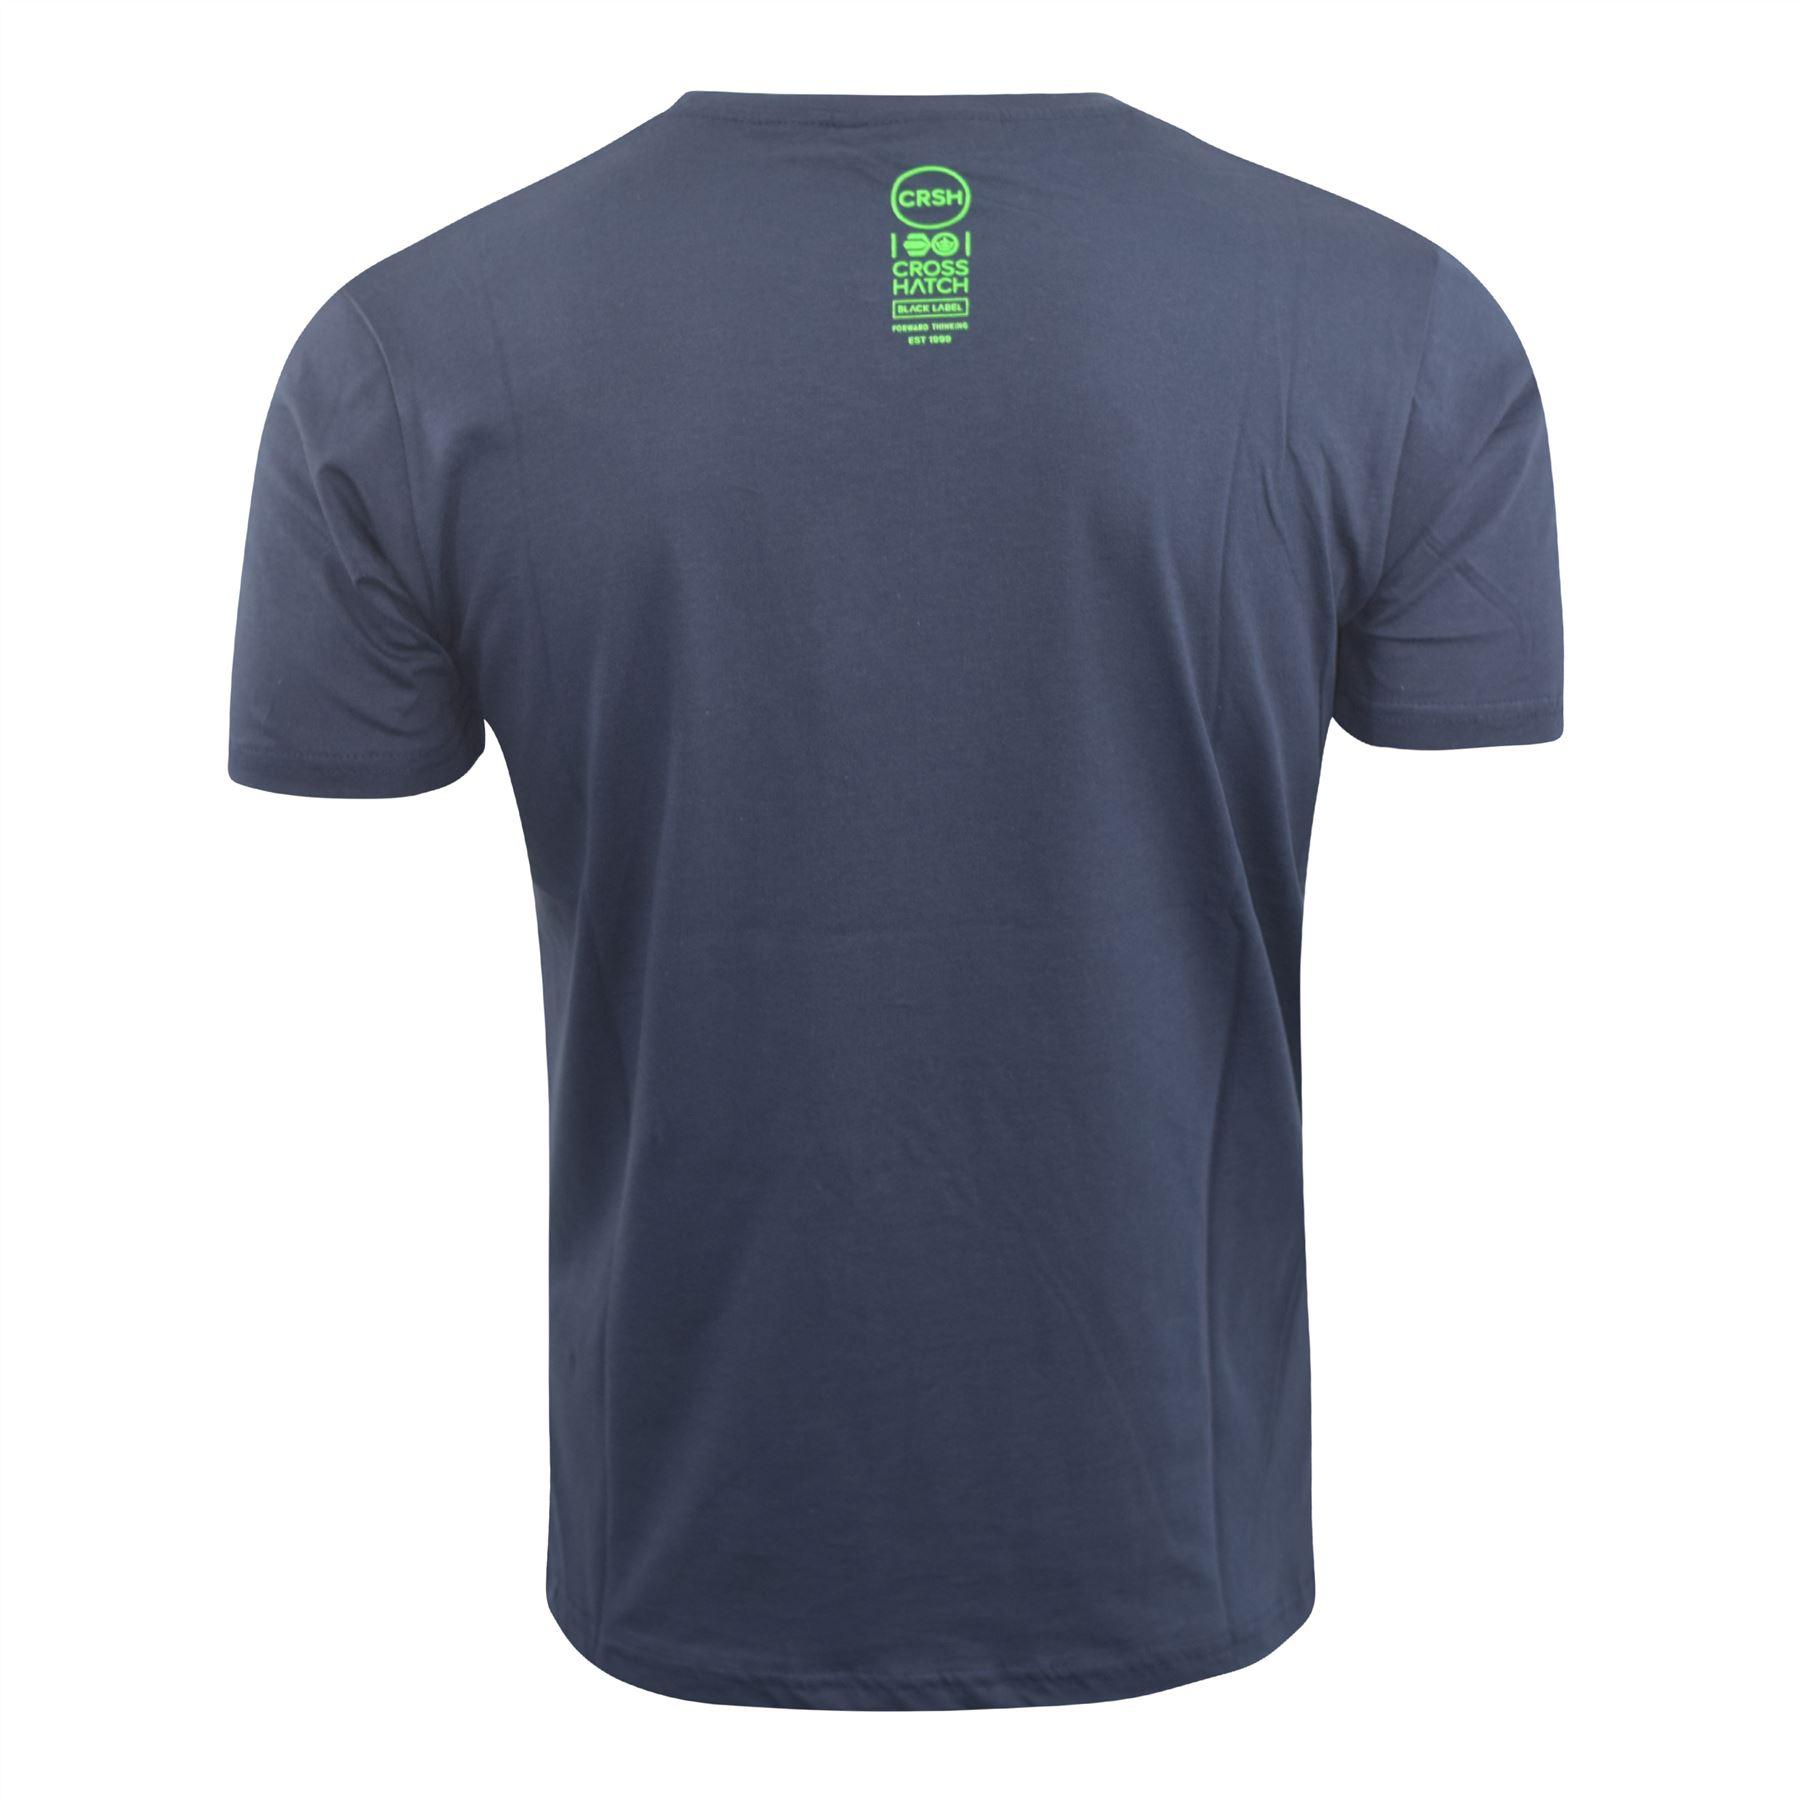 Mens-Crosshatch-T-Shirt-Graphic-Crew-Neck-Tee-Top-Kaeffmore thumbnail 7